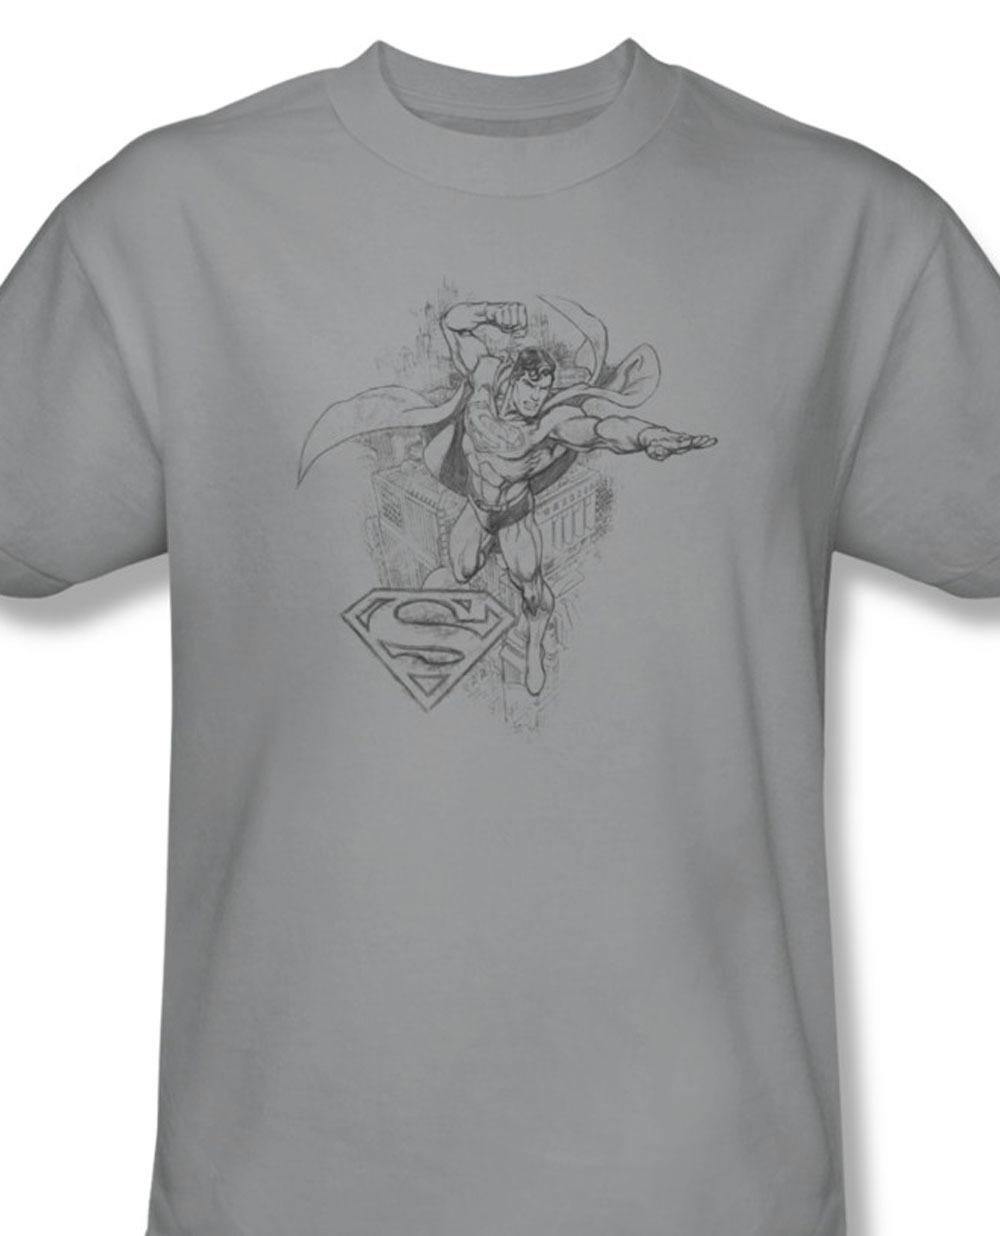 S superhero superman pencil illustration wonder woman batman for sale online gray graphic tshirt